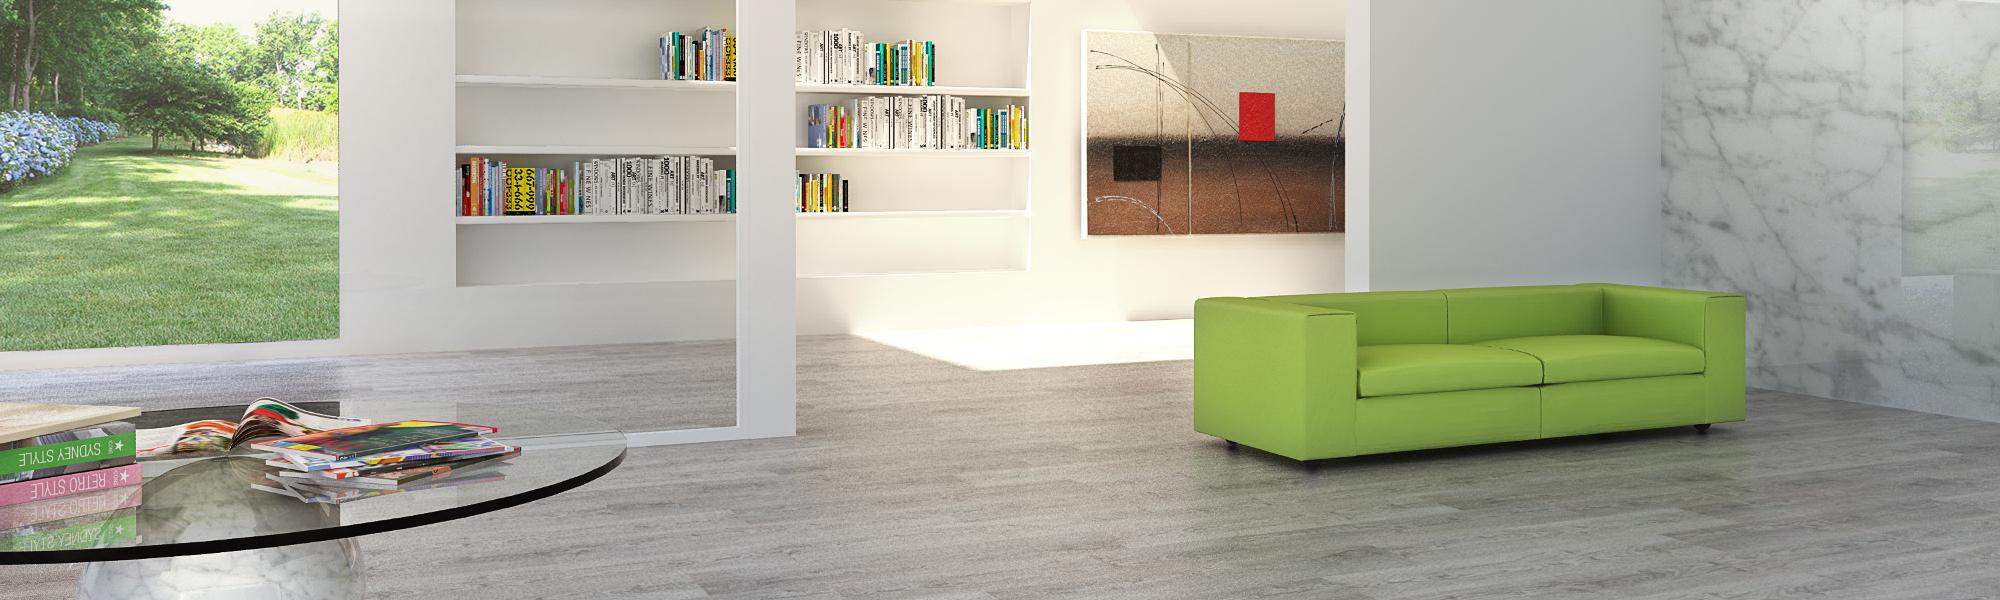 pavimento-lvt-fintolegno-grigio [©SWING] aria-label=